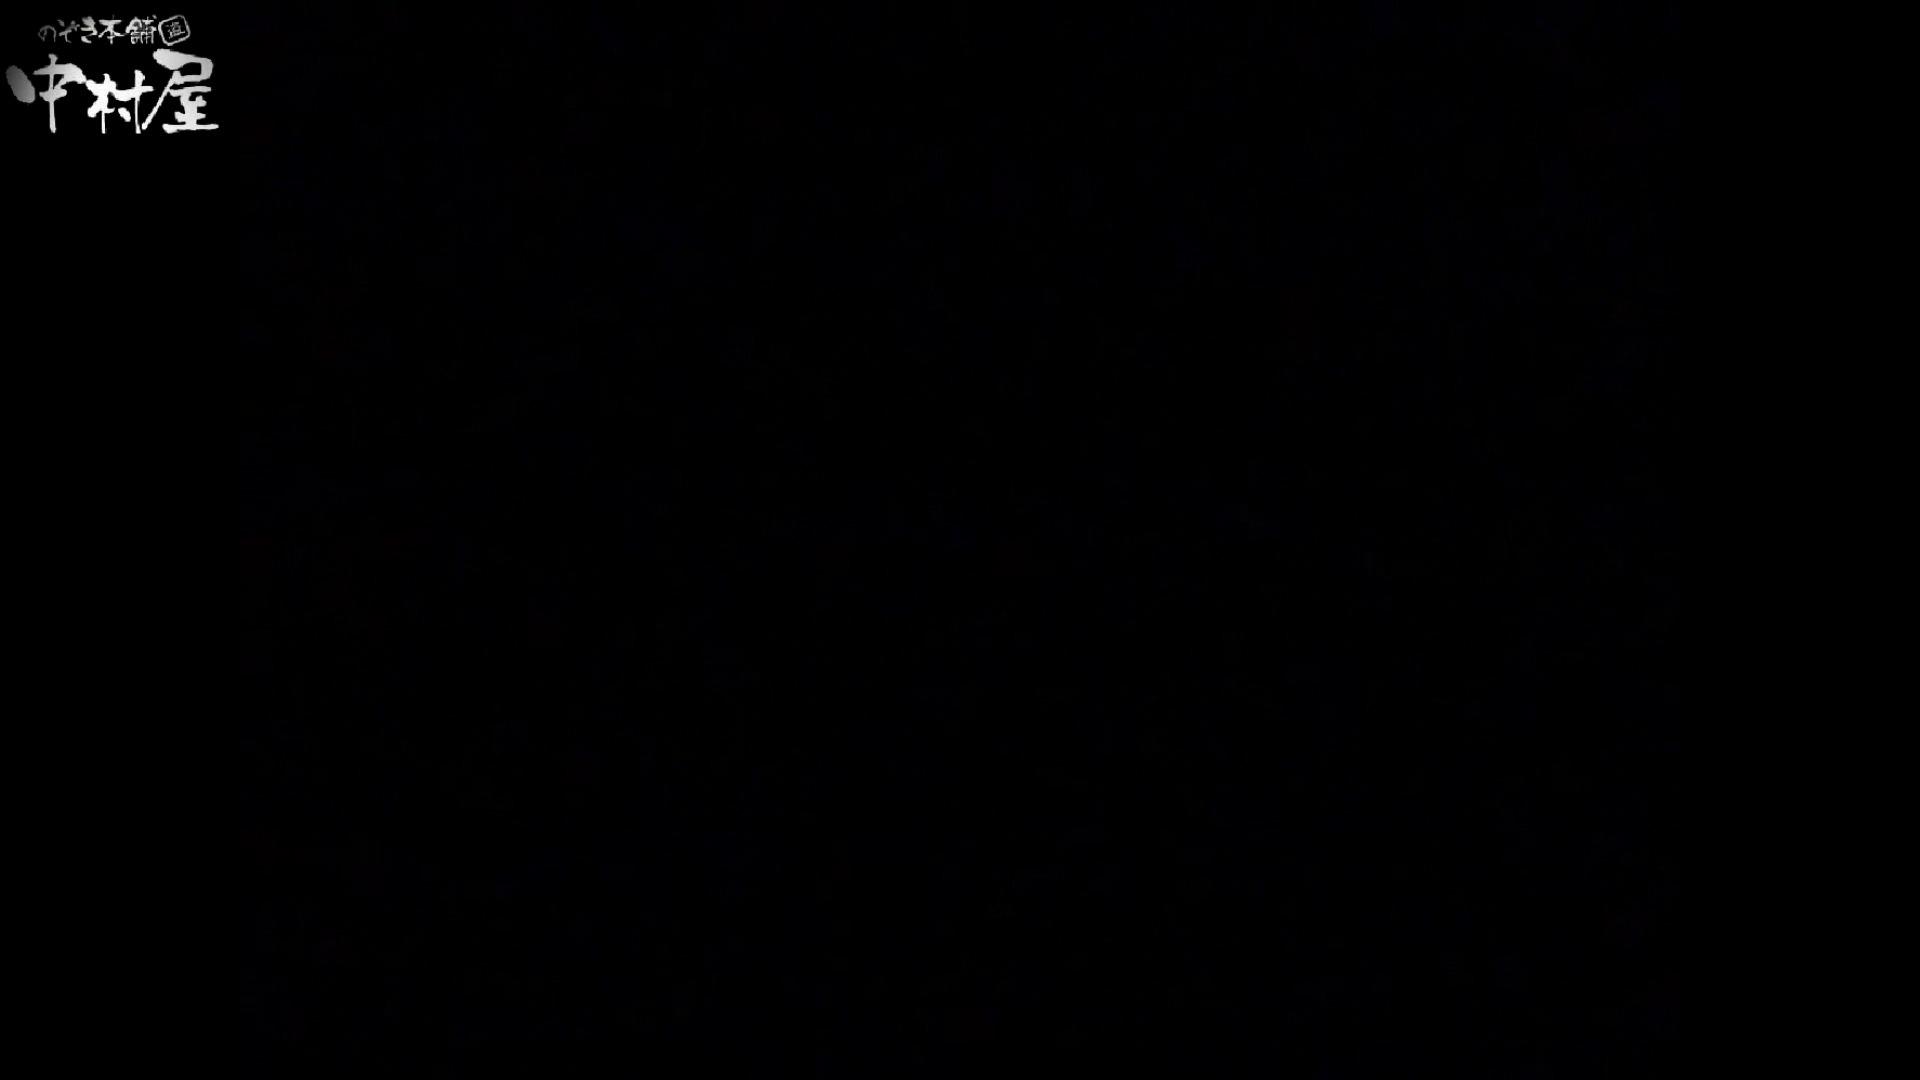 民家風呂専門盗撮師の超危険映像 vol.012 美少女のエロ生活  73連発 54